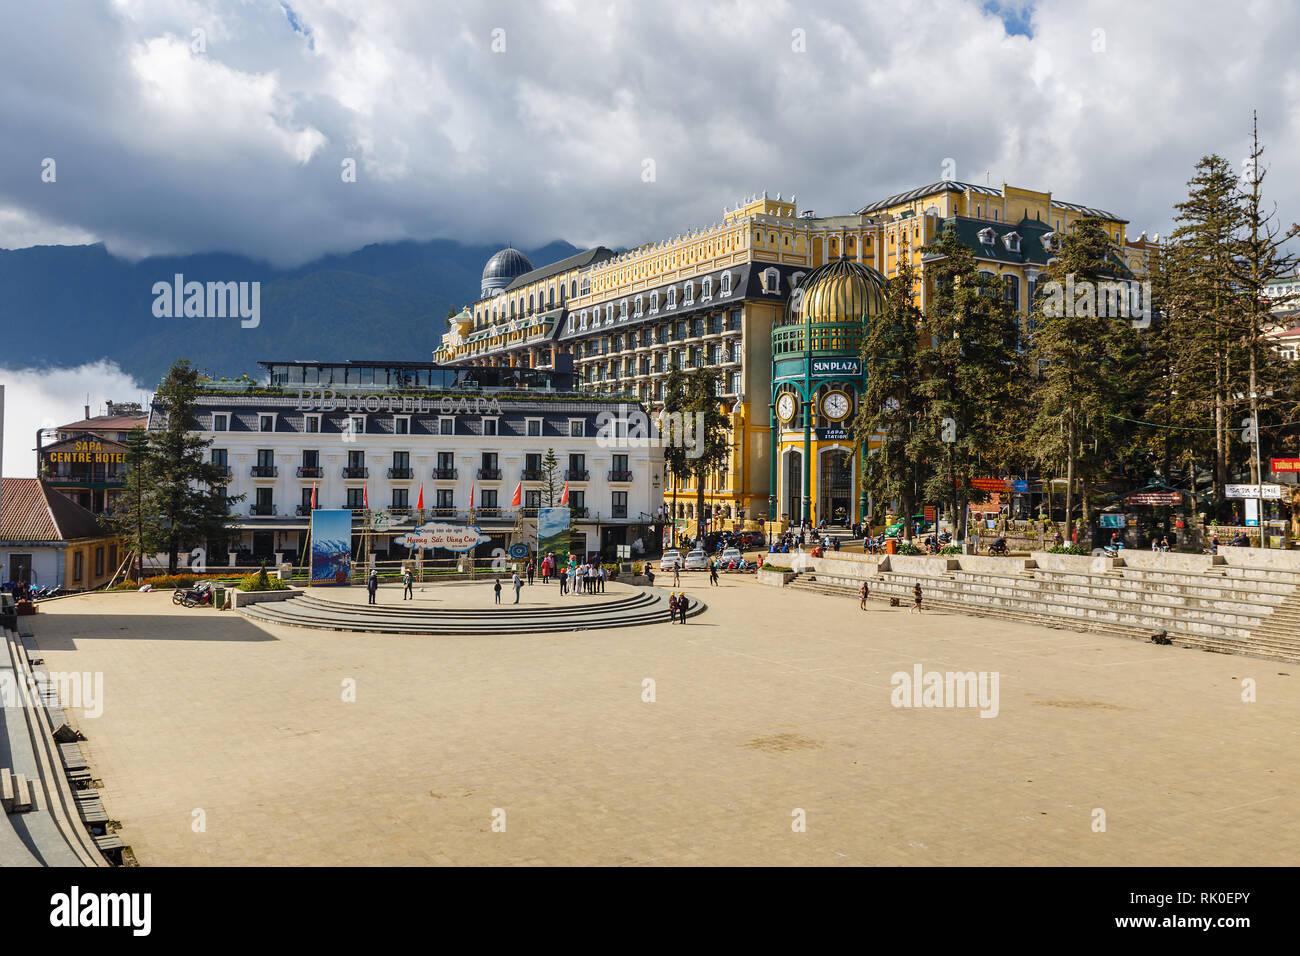 Sapa, Vietnam - November 20, 2018: View of Sun plaza SAPA station building new shopping mall in SAPA northwest Vietnam. - Stock Image